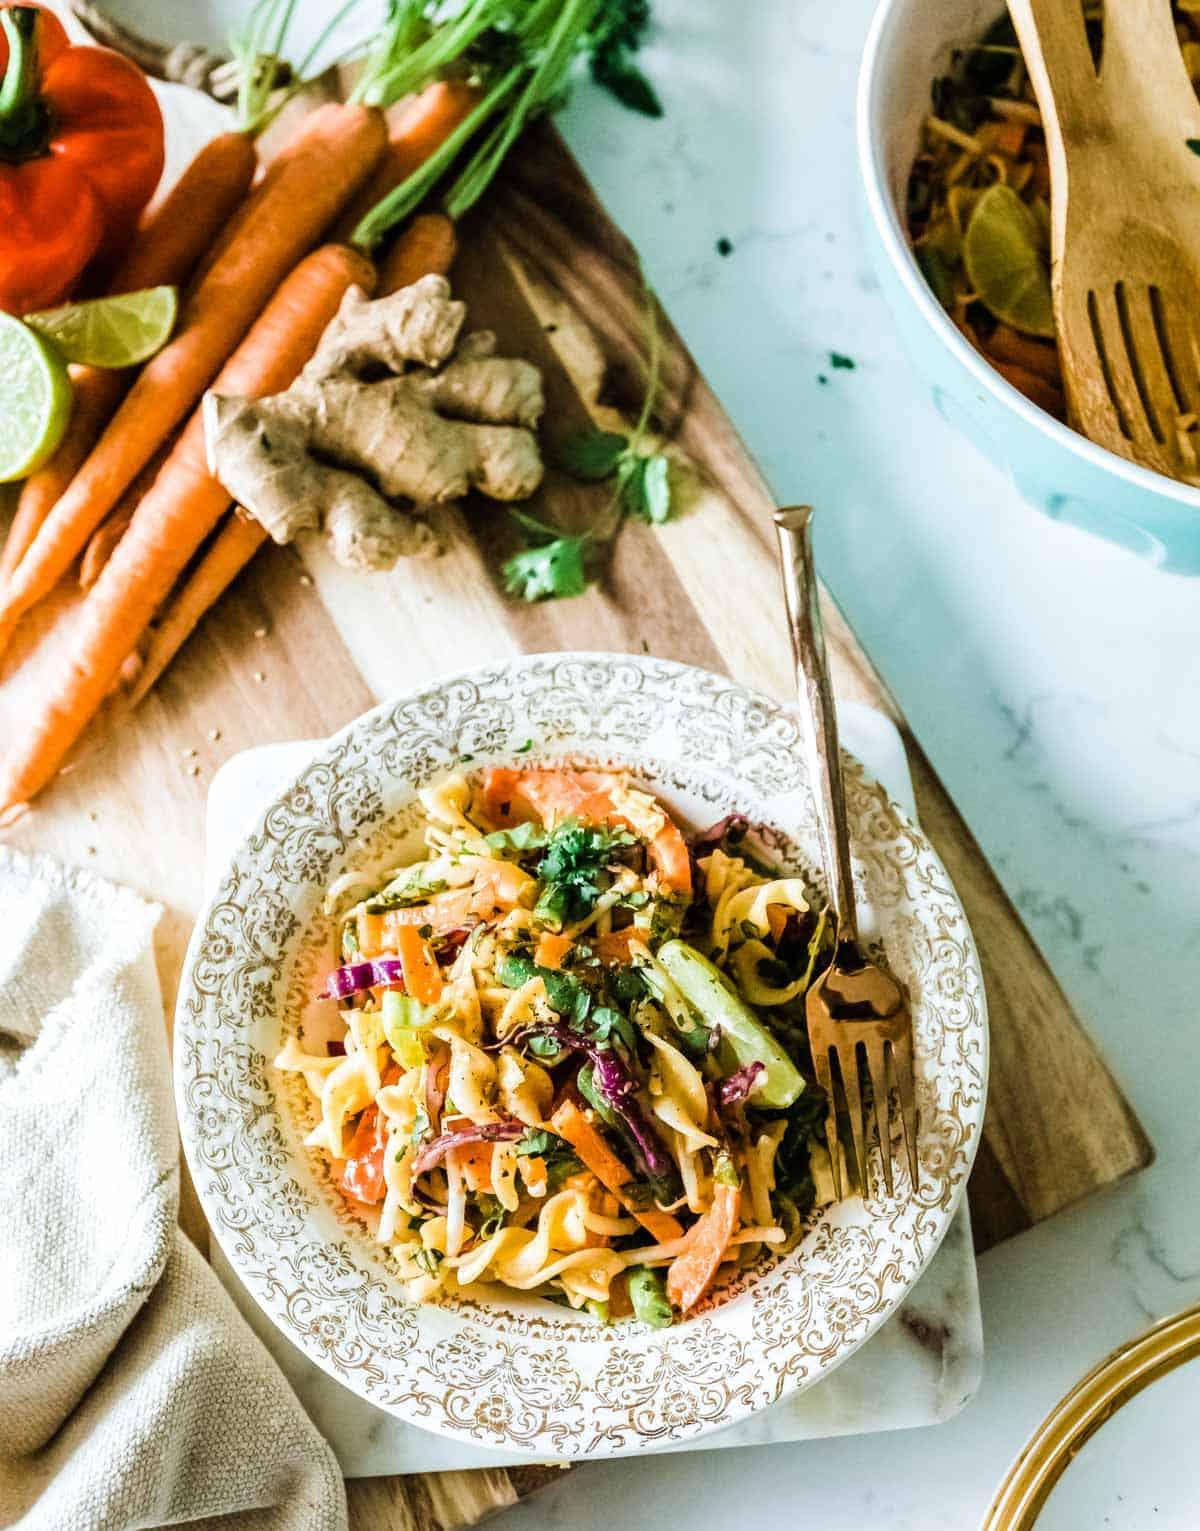 cold noodle salad ready to serve